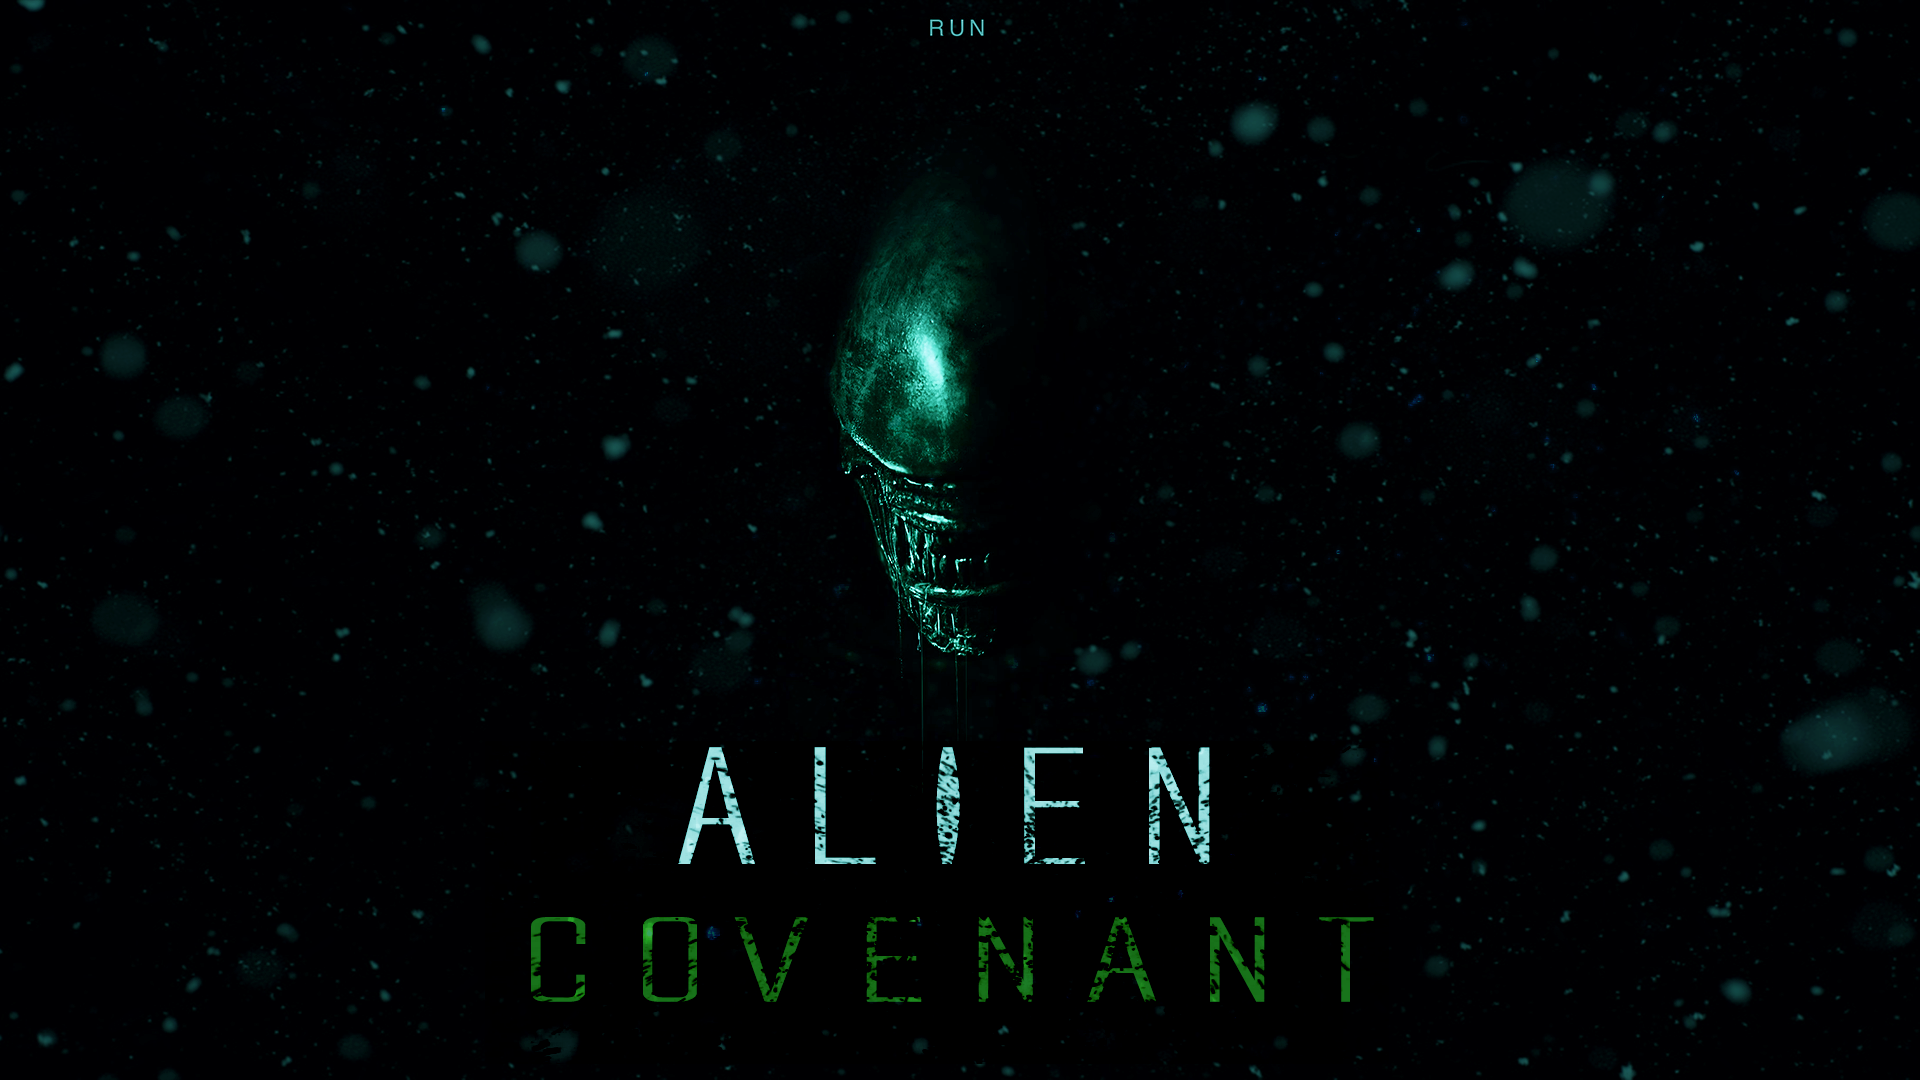 alien covenant game image